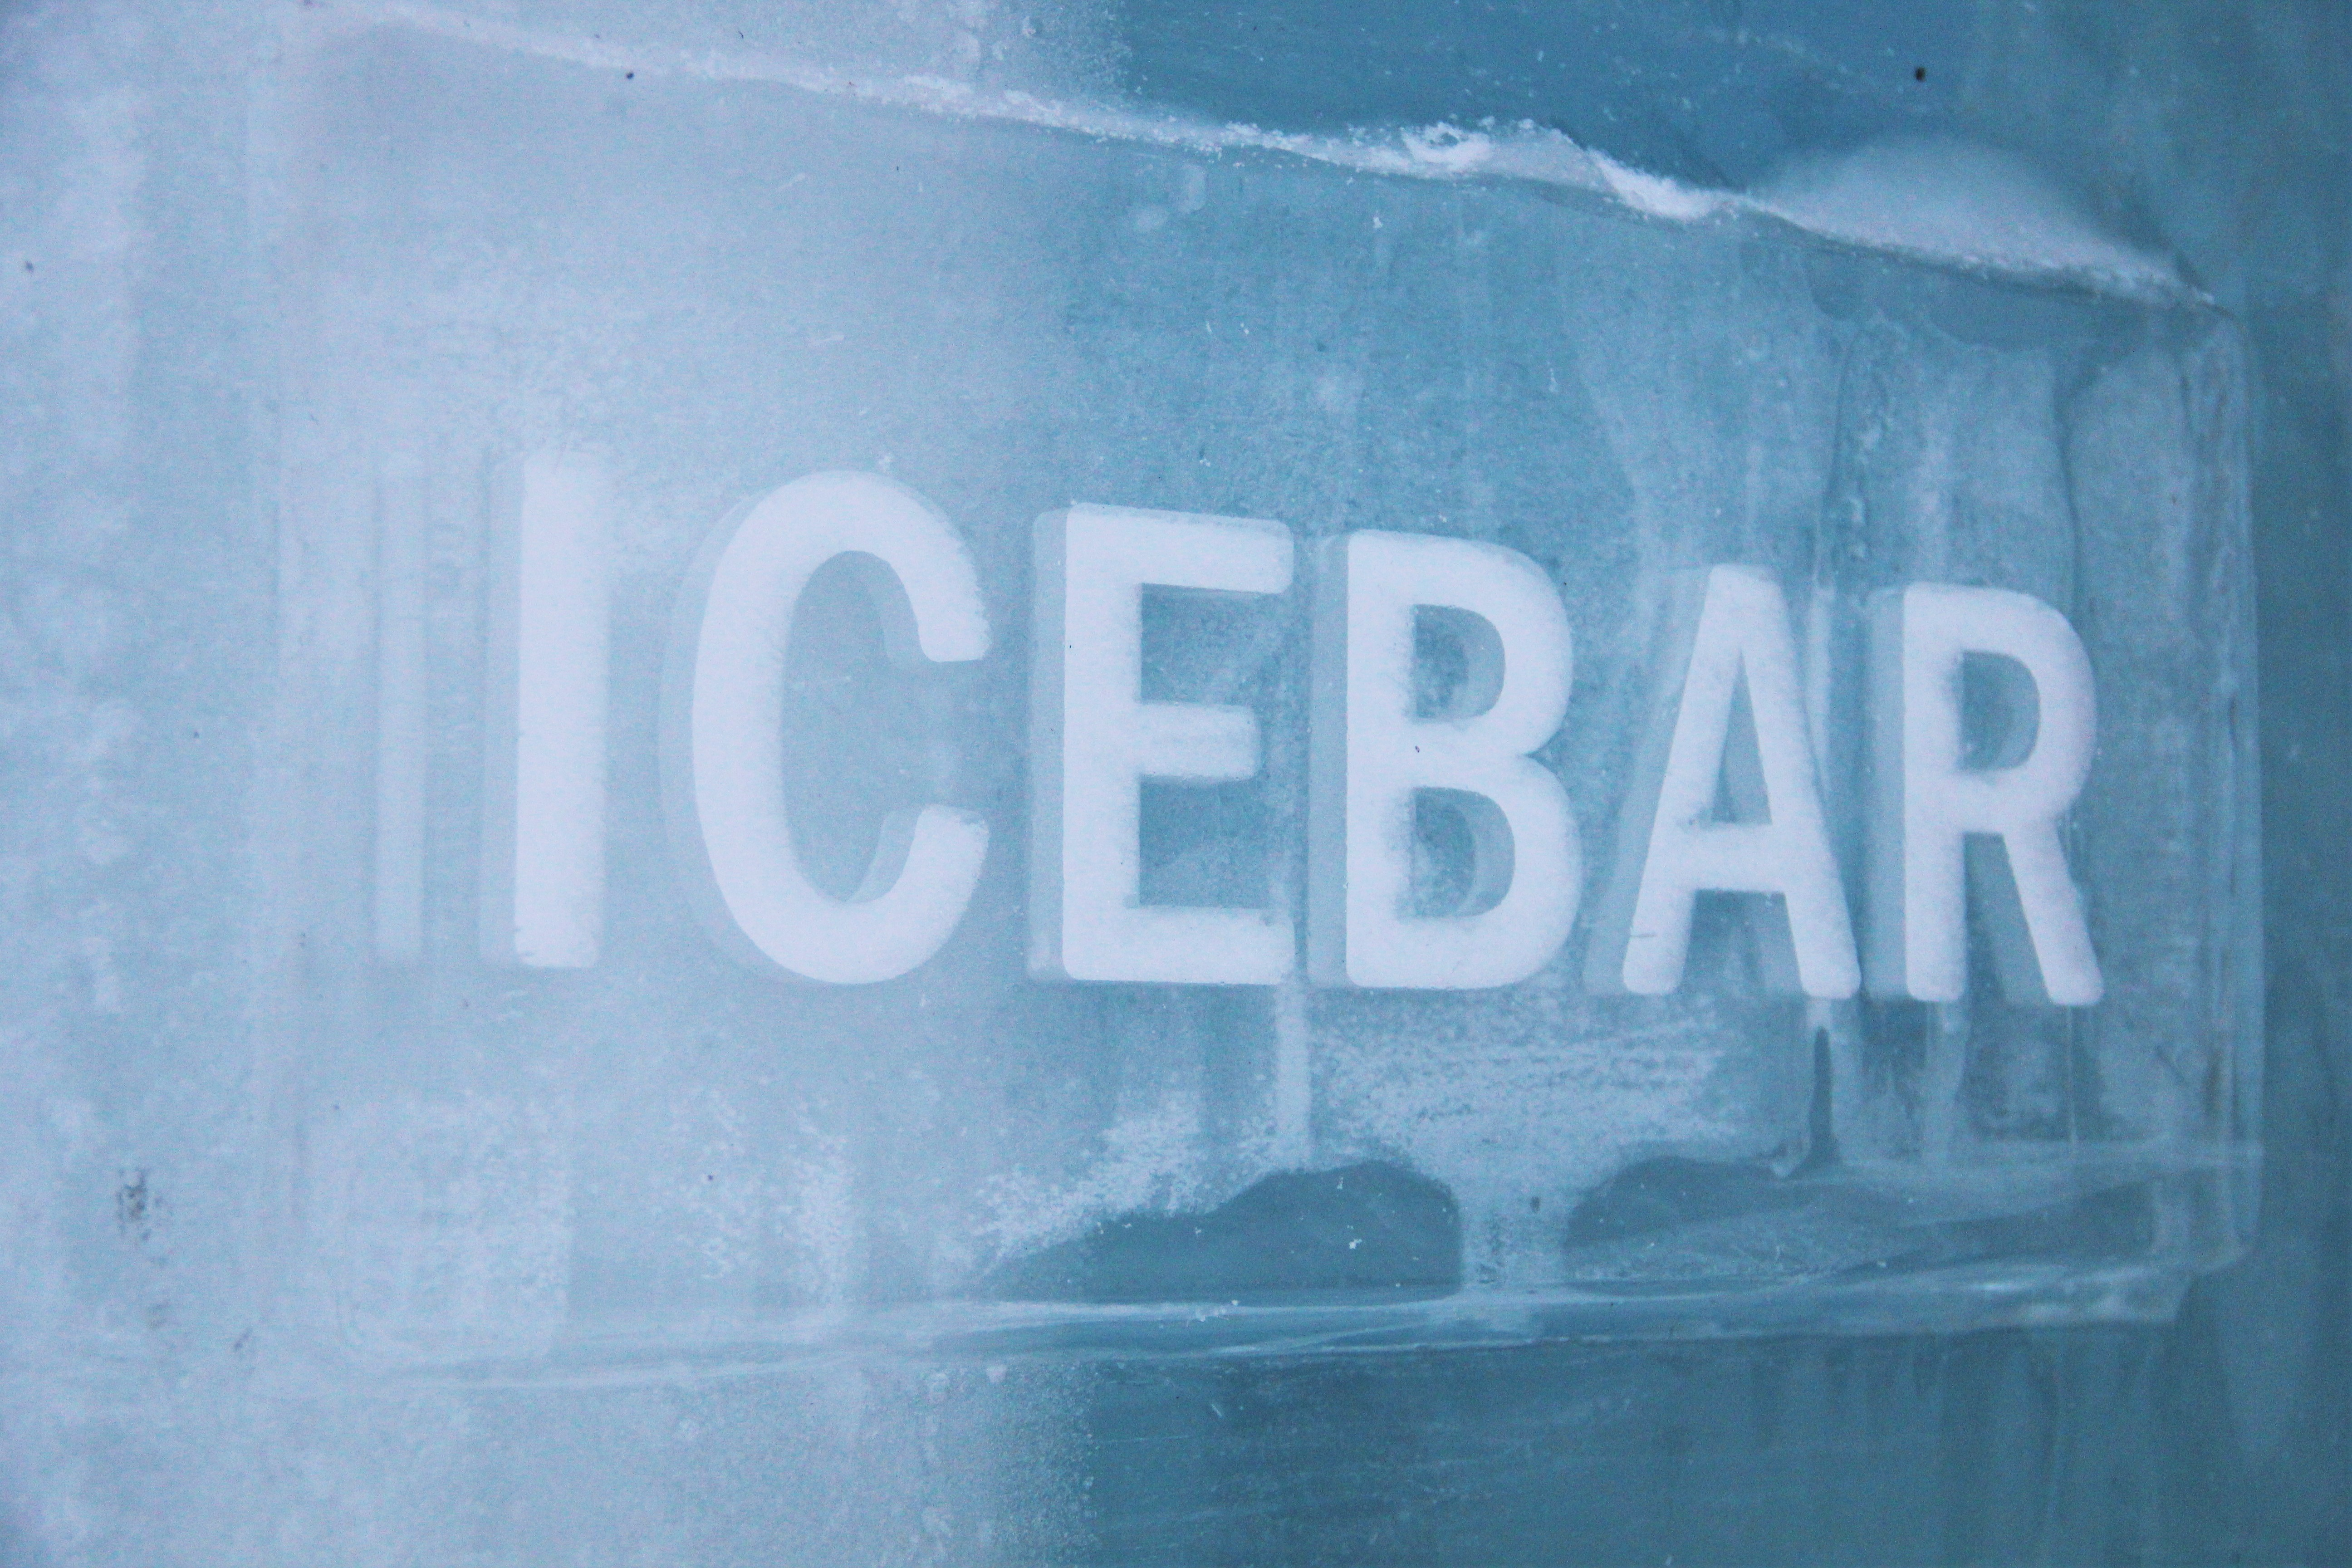 icebar-kiruna-suede-mylittleroad